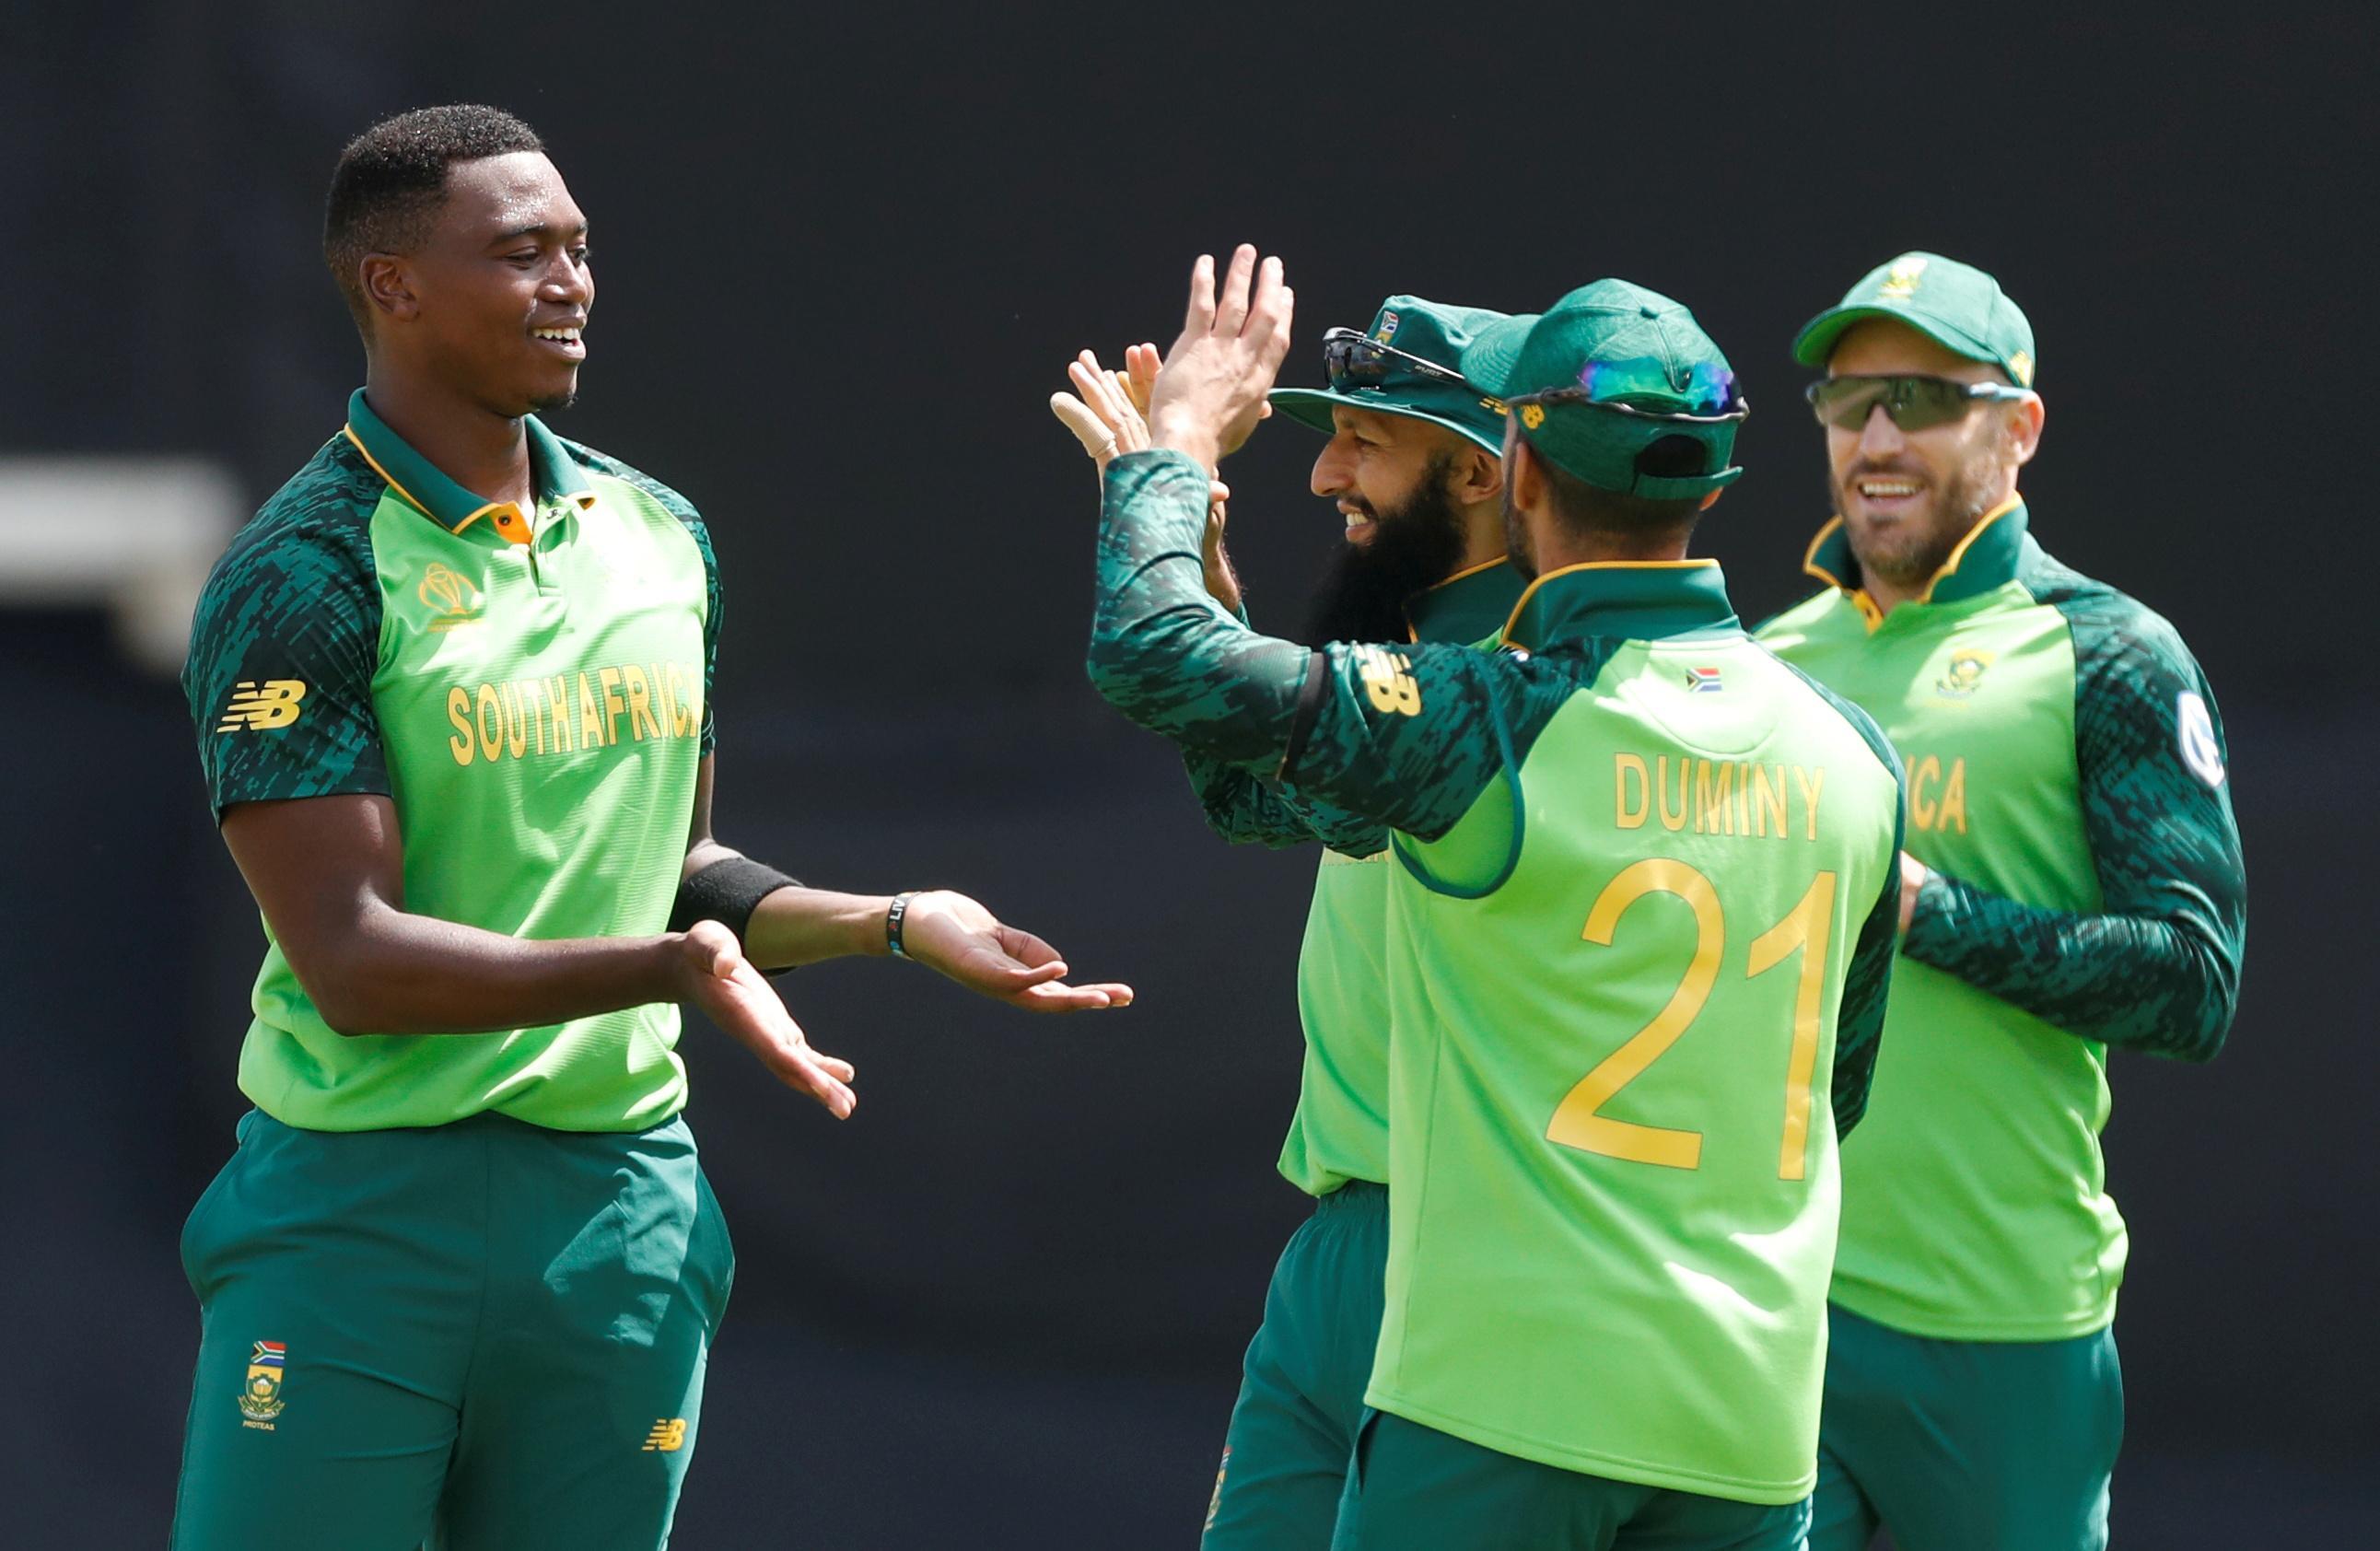 South Africa's Ngidi set to return for New Zealand clash